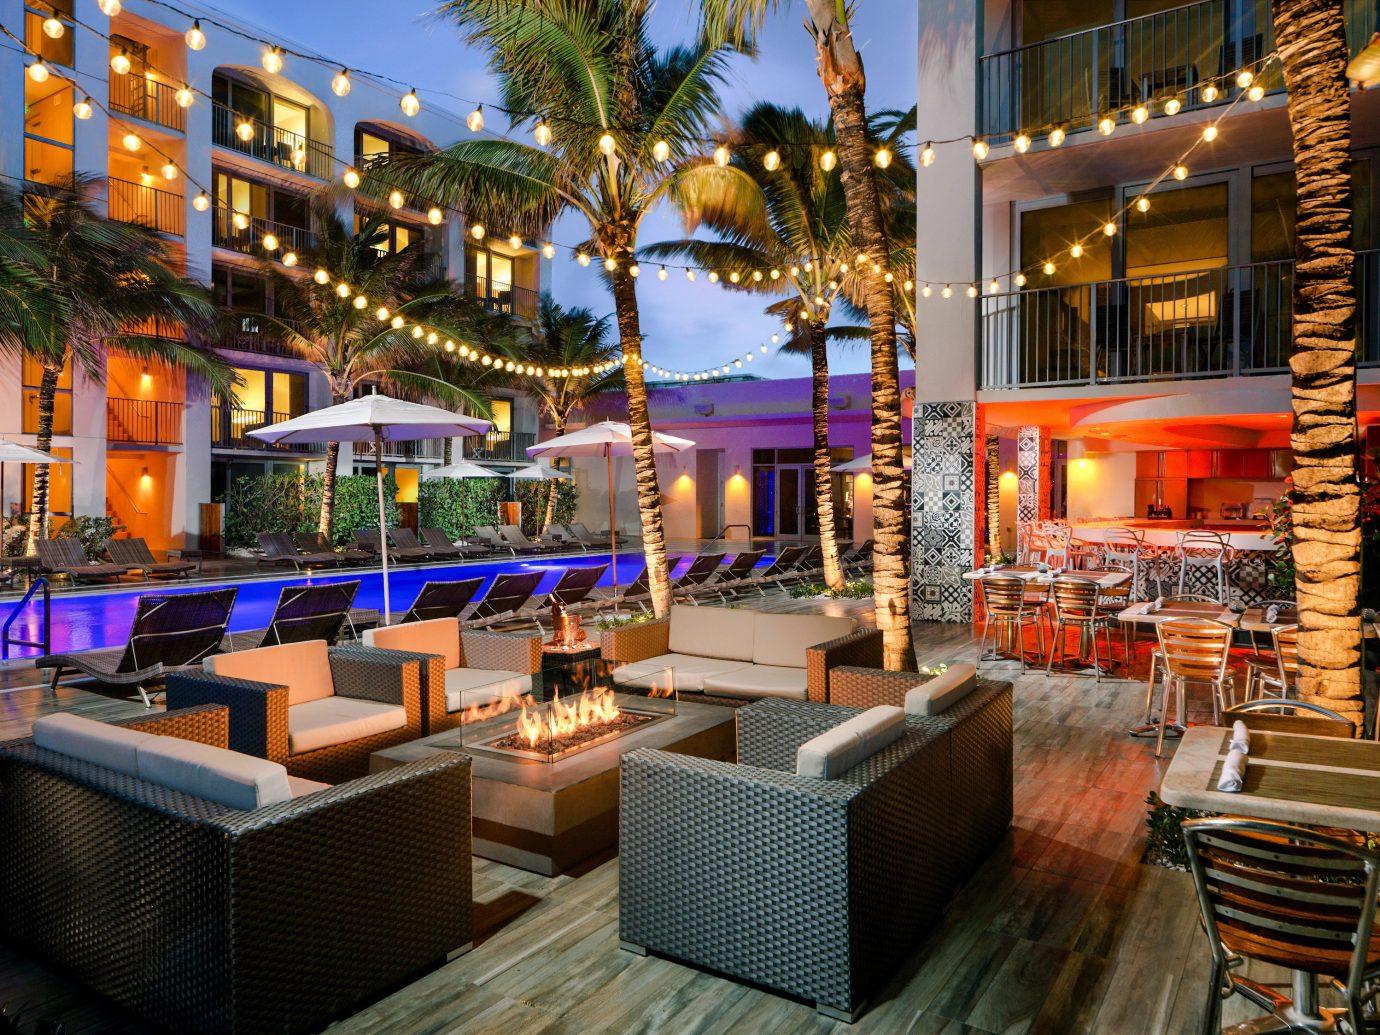 Trip Ideas building property Resort estate condominium home real estate interior design Villa Lobby mansion restaurant several